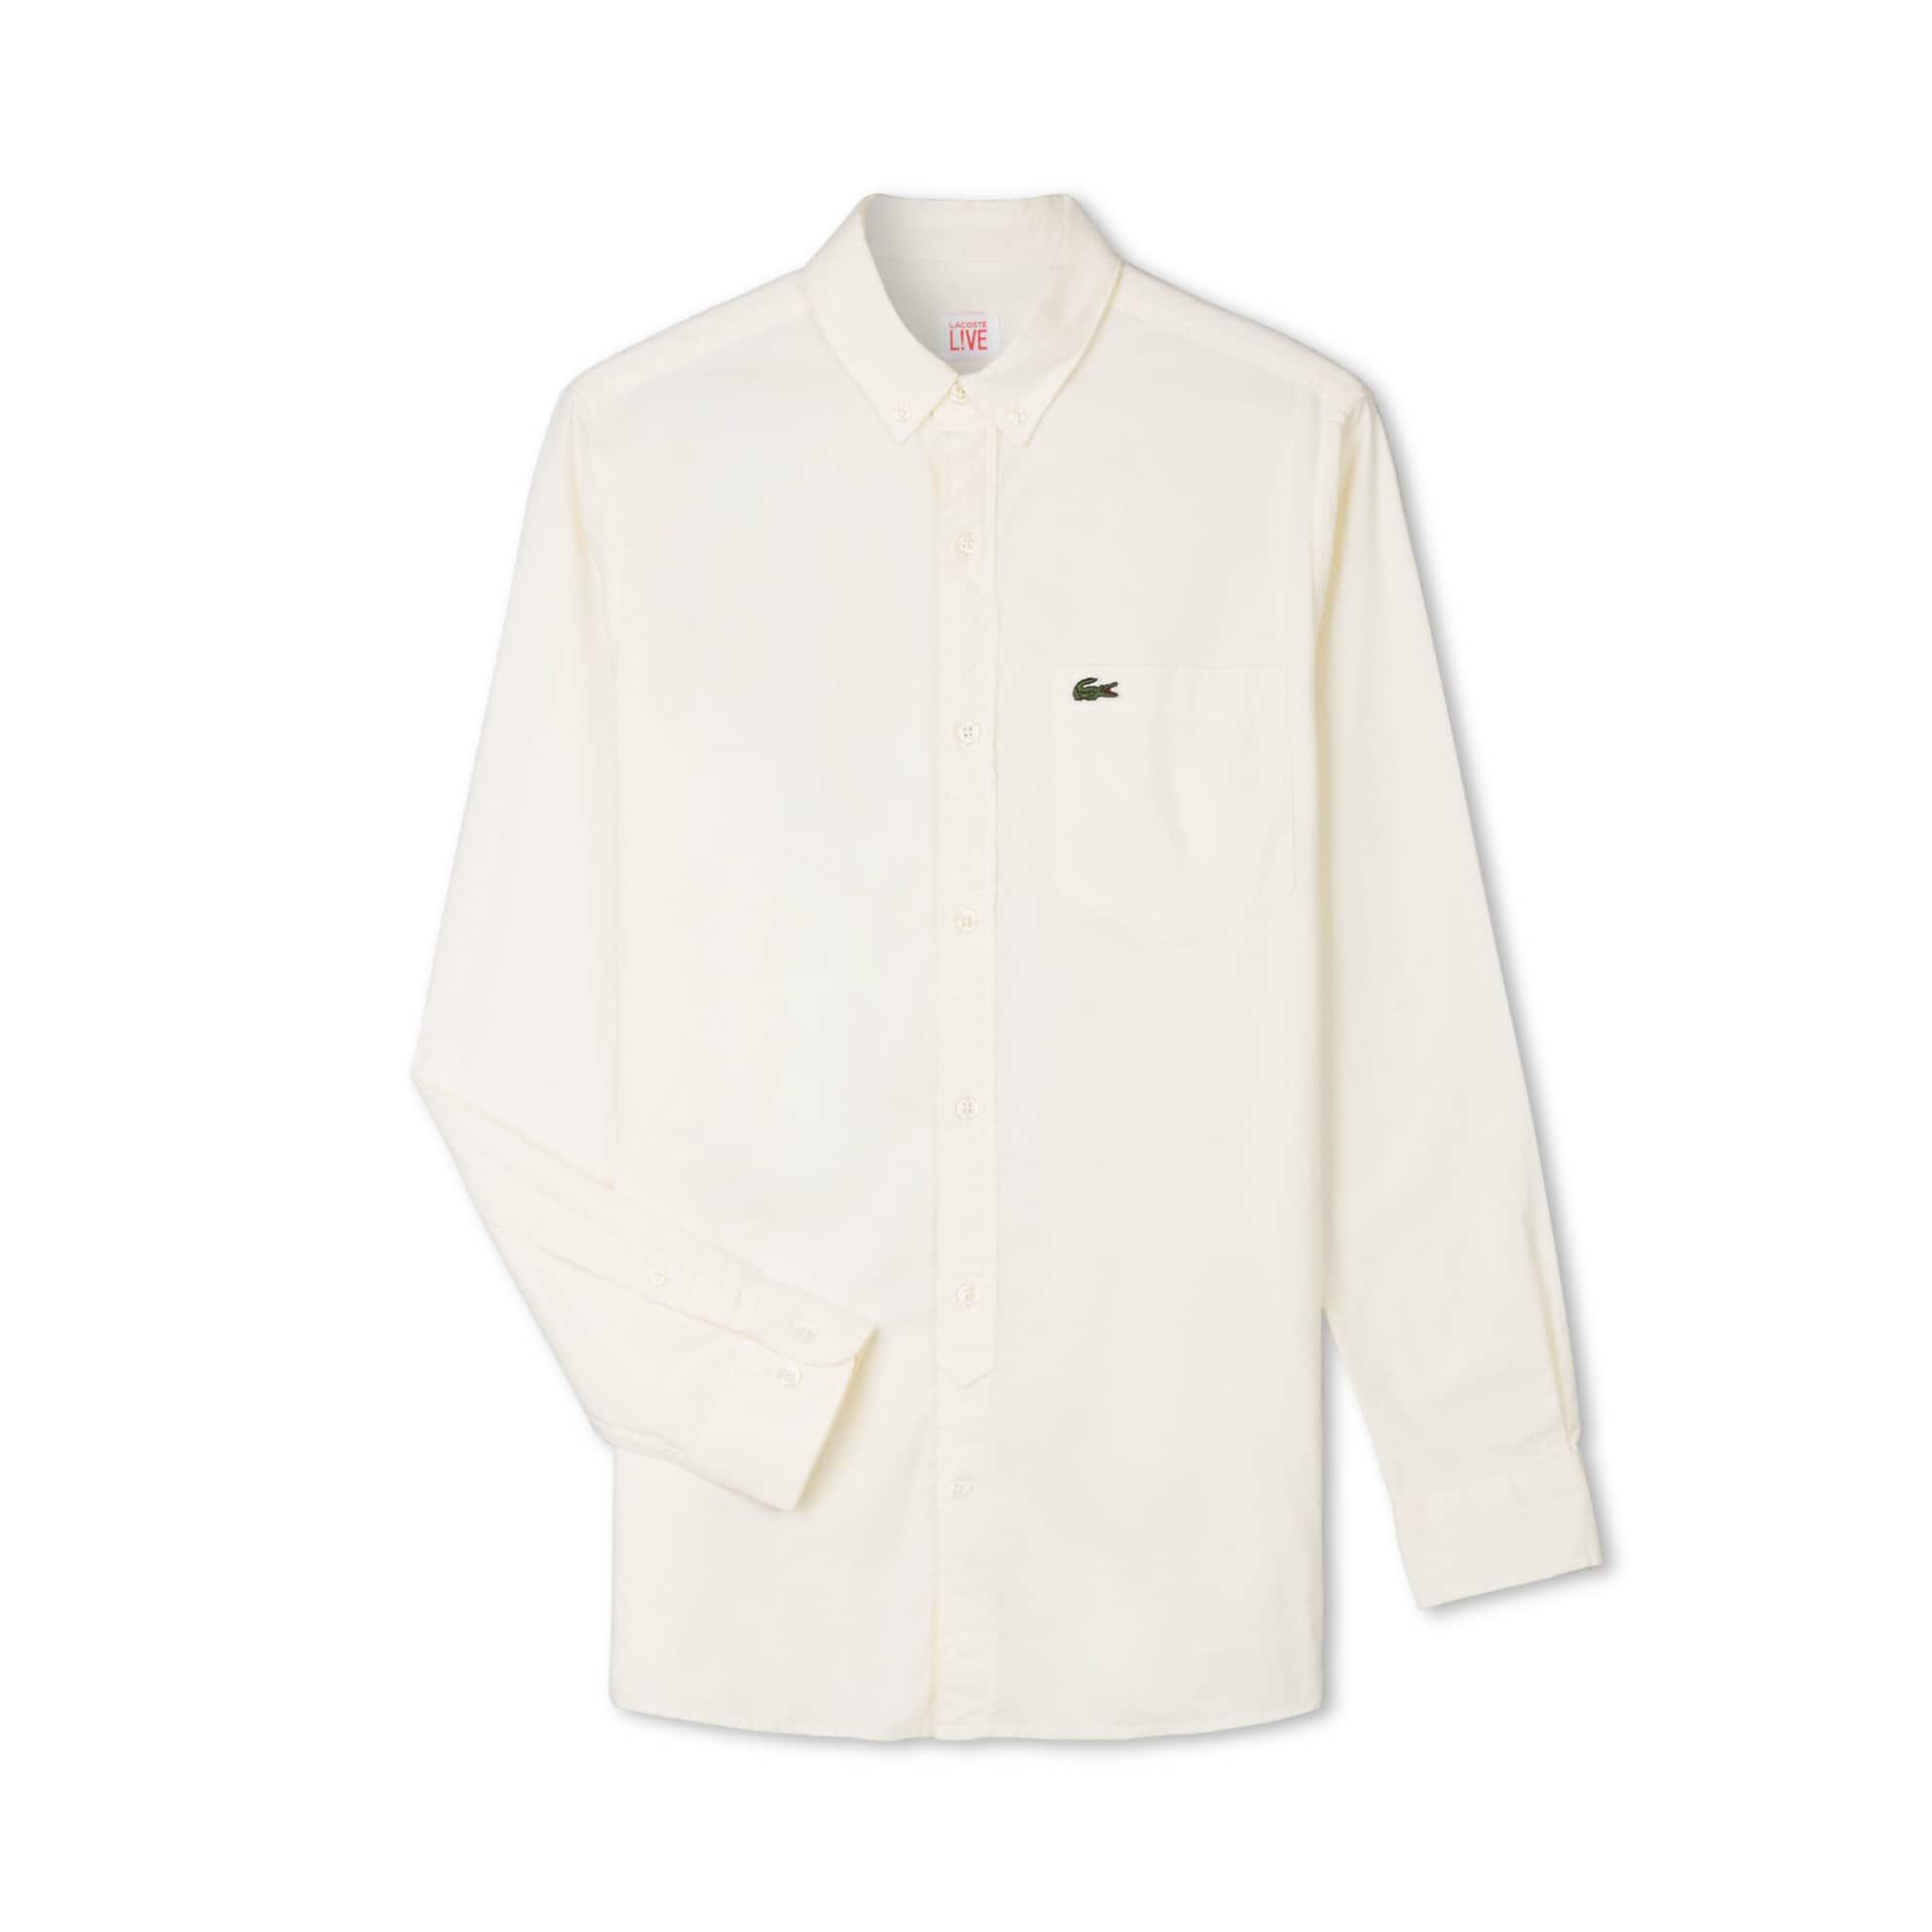 Lacoste L!VE系列男士长袖衬衫